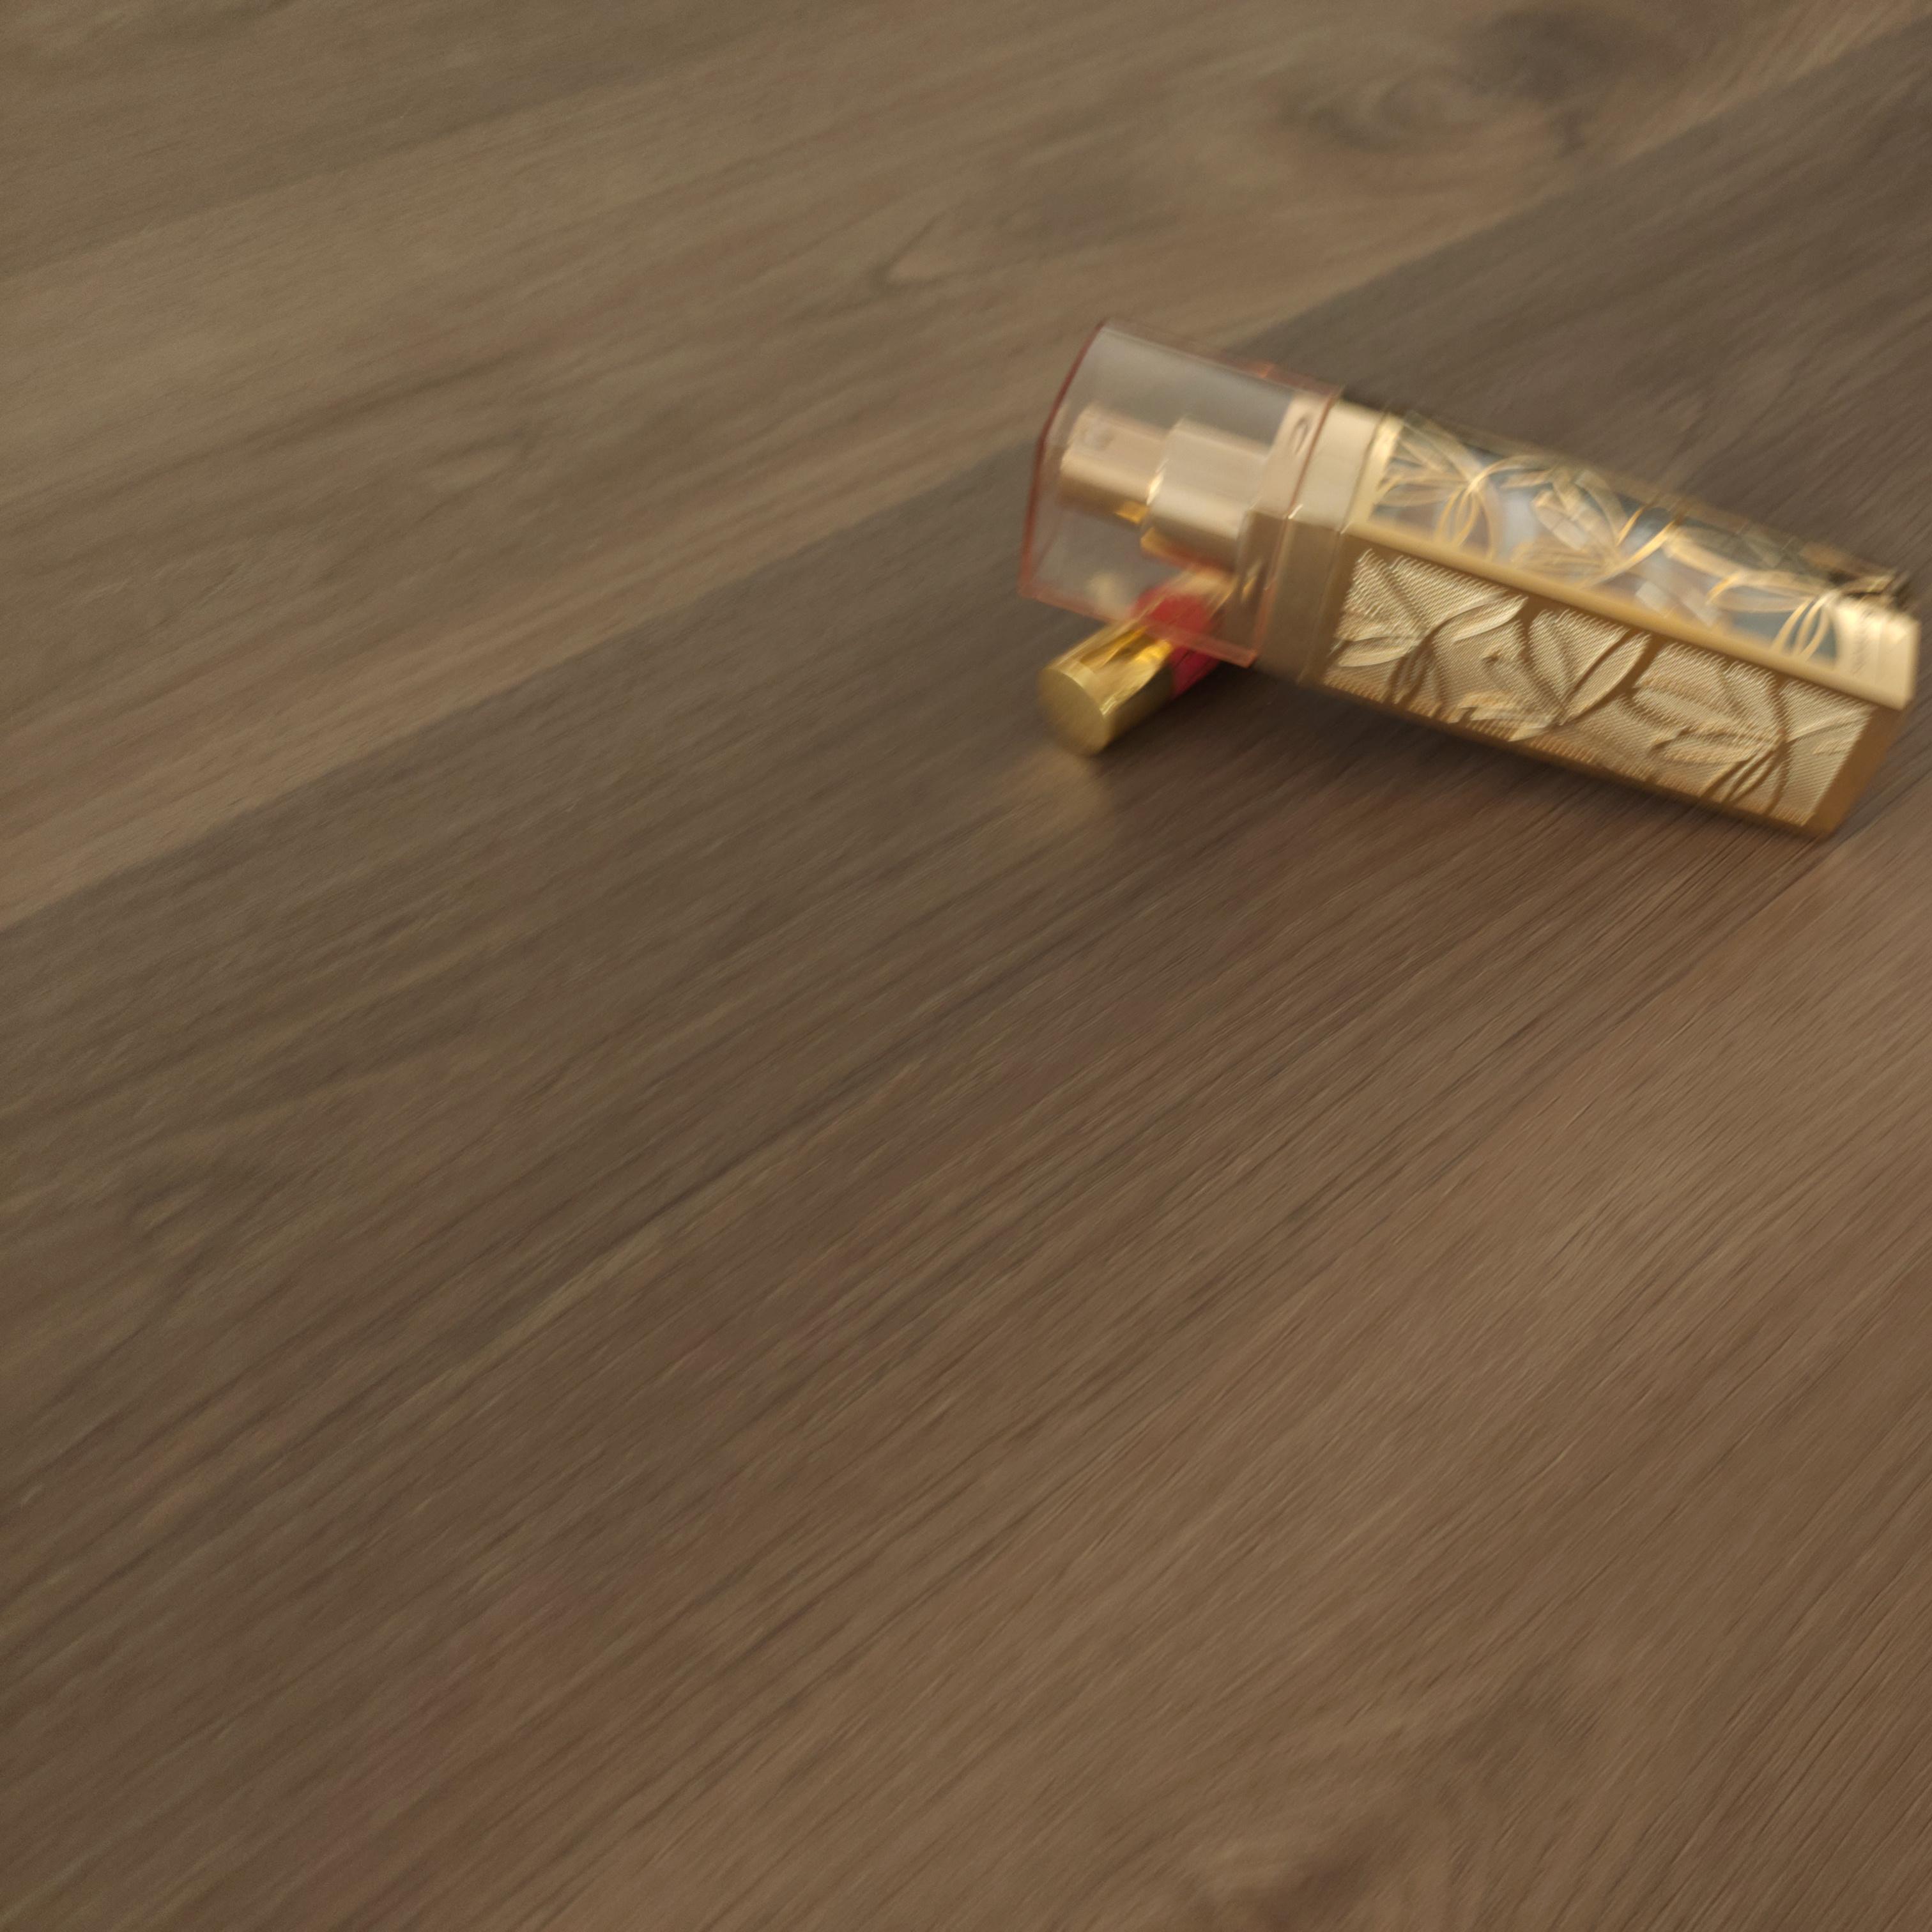 spc piso vinil waterproof heat resistant pvc prancha oak walnut color vinyl flooring